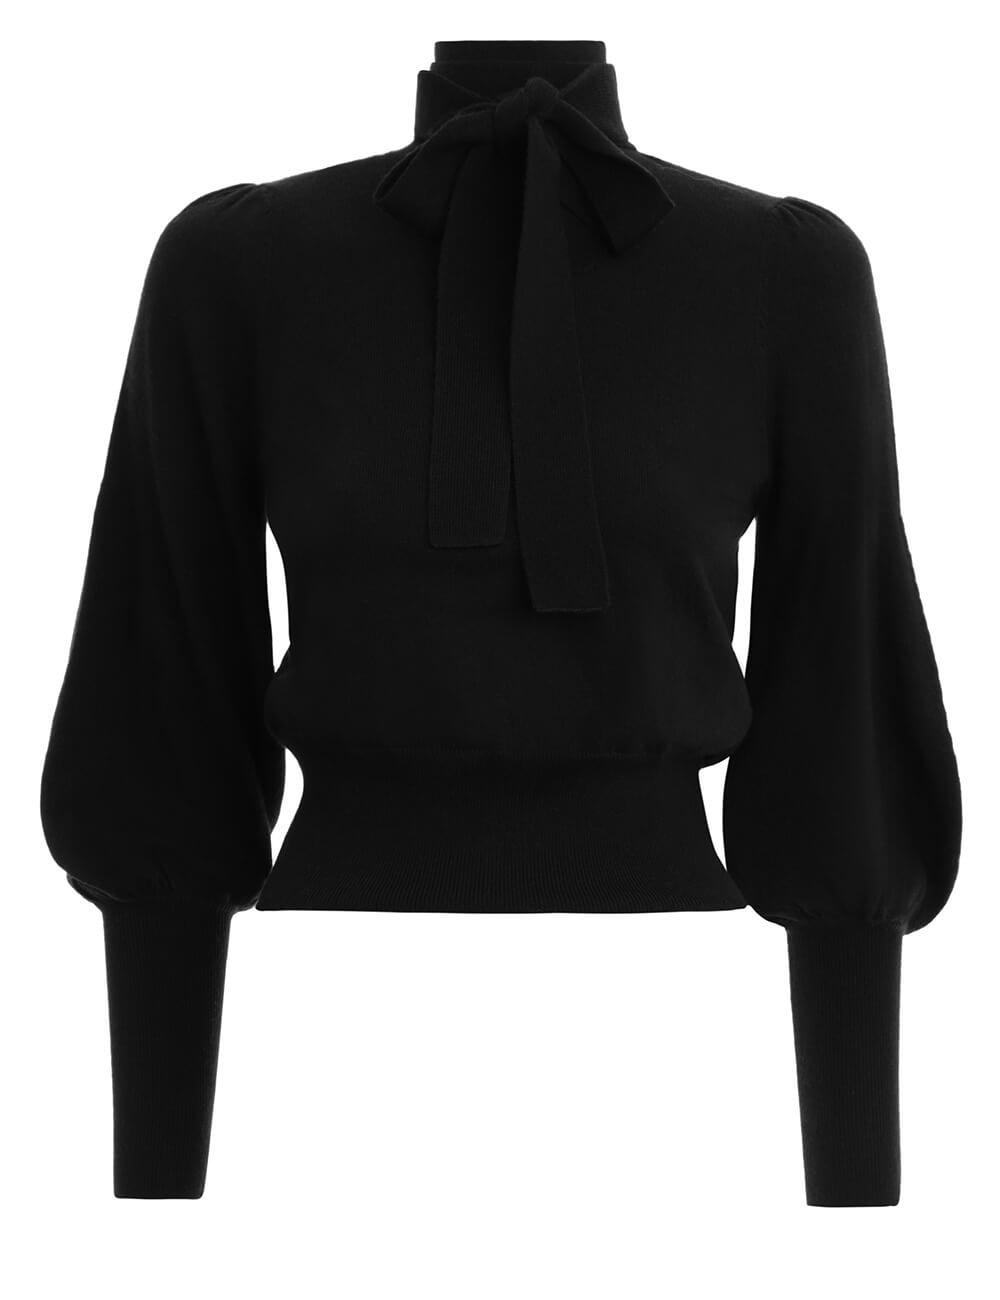 82fcd58ae7fa98 Shop Women's Designer Tops Online | ZIMMERMANN